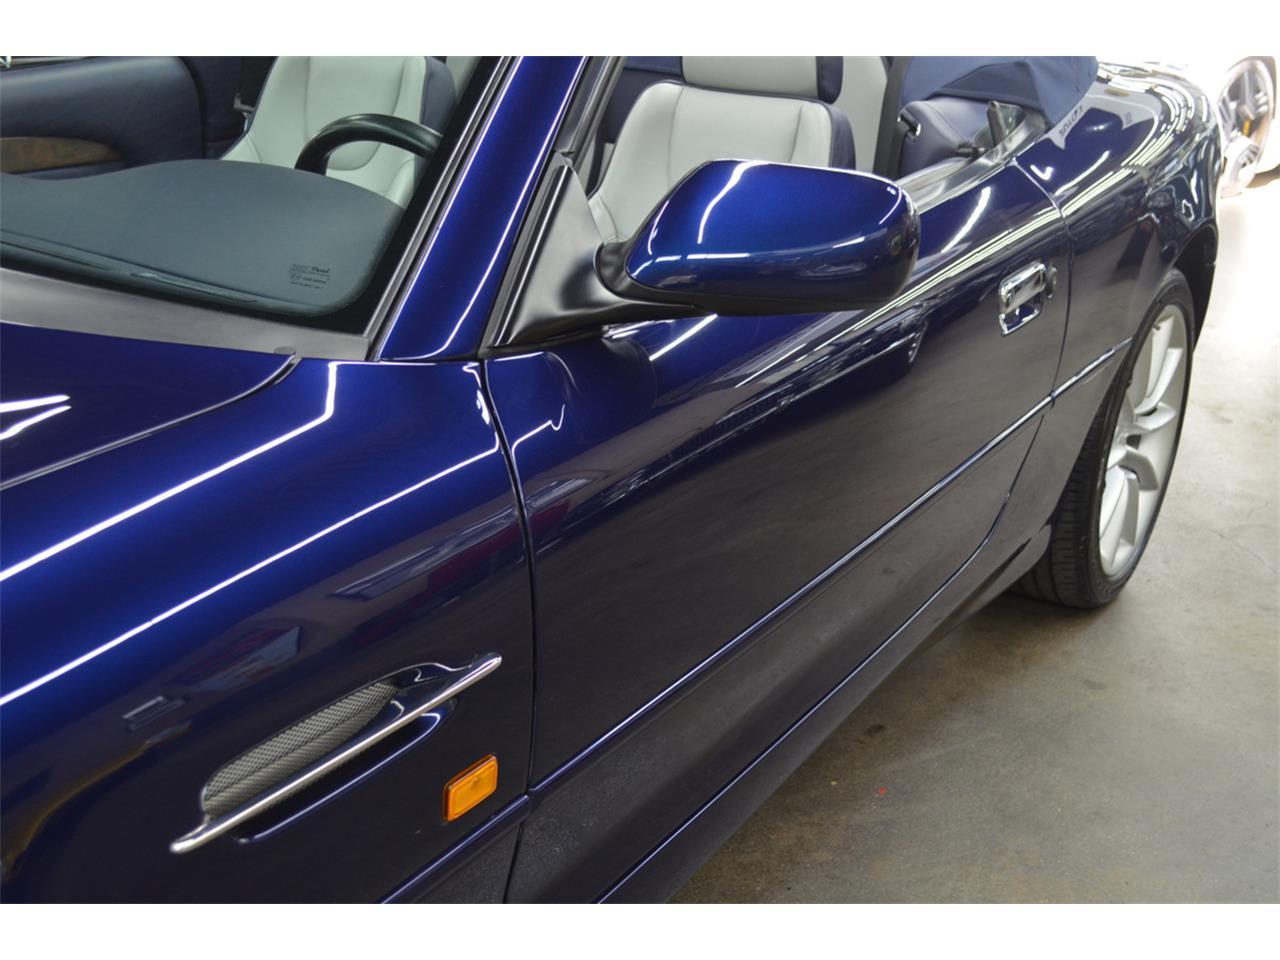 2001 Aston Martin DB7 Vantage Volante (CC-1352117) for sale in Huntington Station, New York